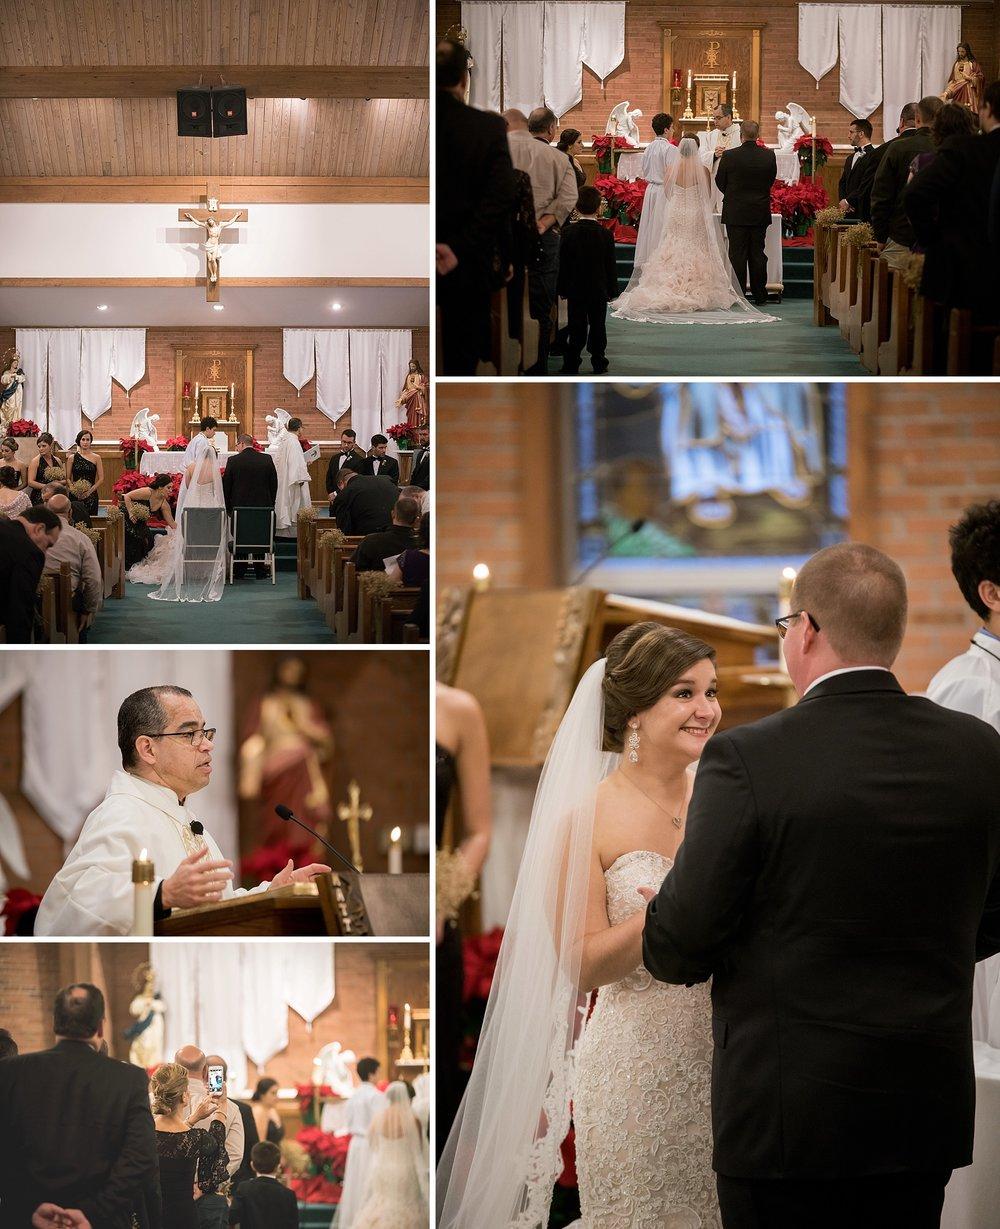 Goldsboro-NC-Photography-Wedding-166.jpg